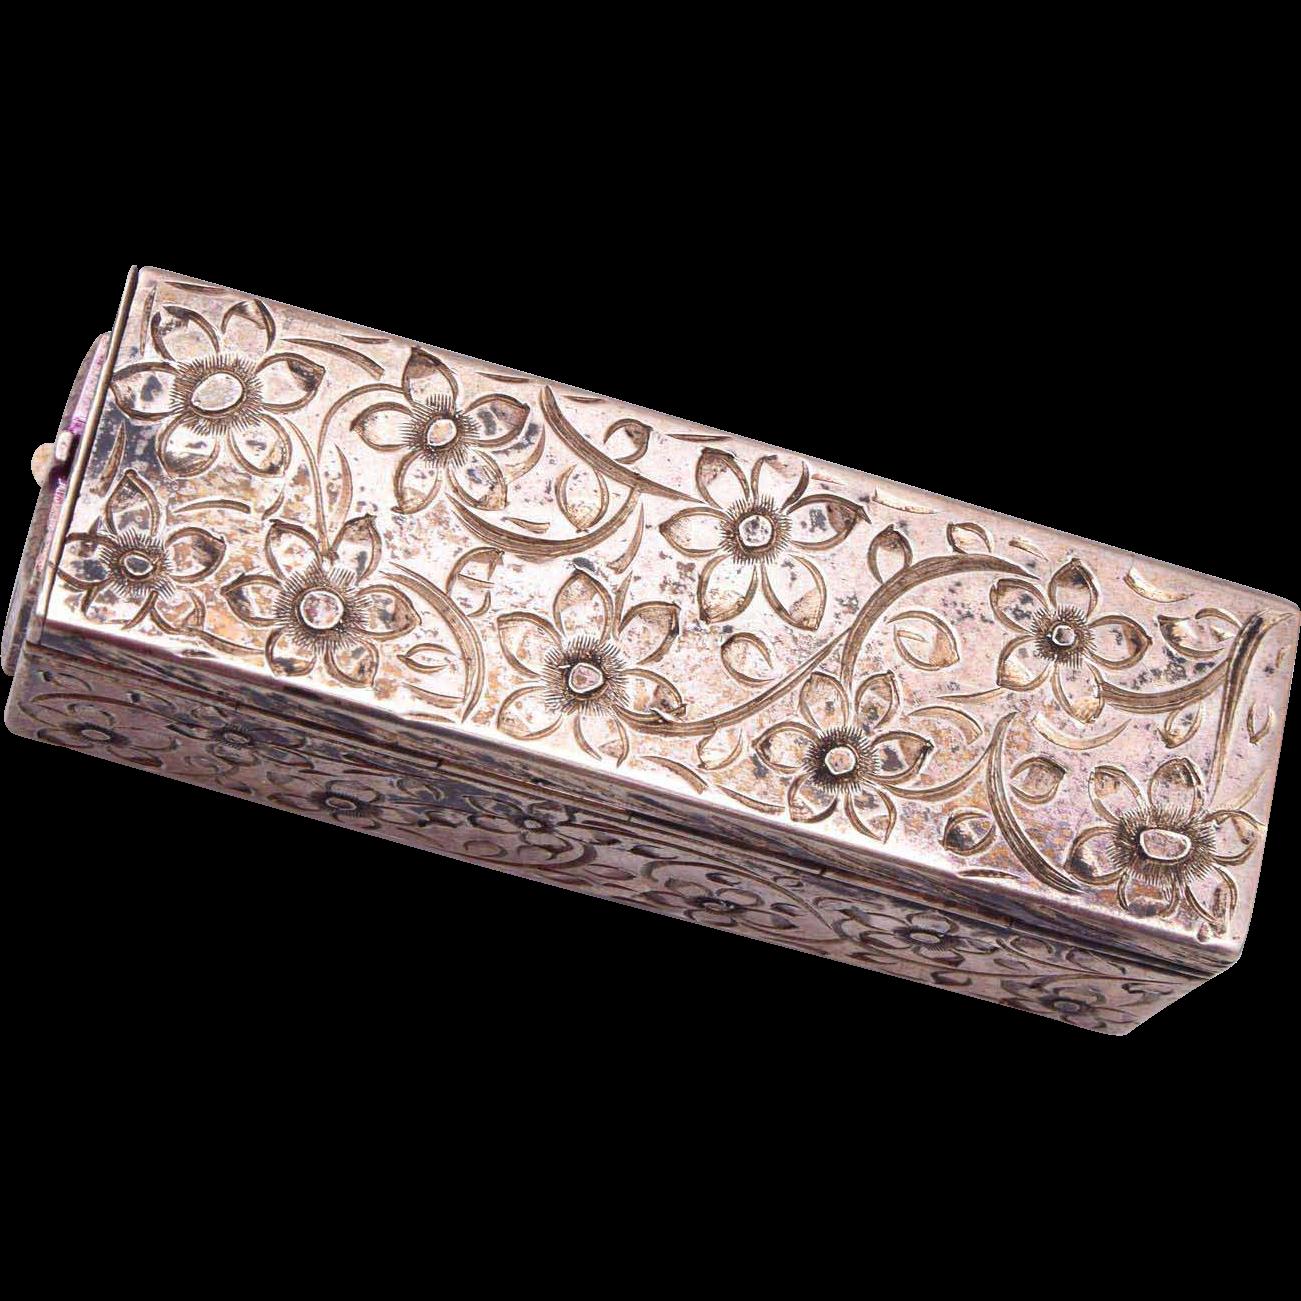 800 Silver Lipstick Holder with Mirror